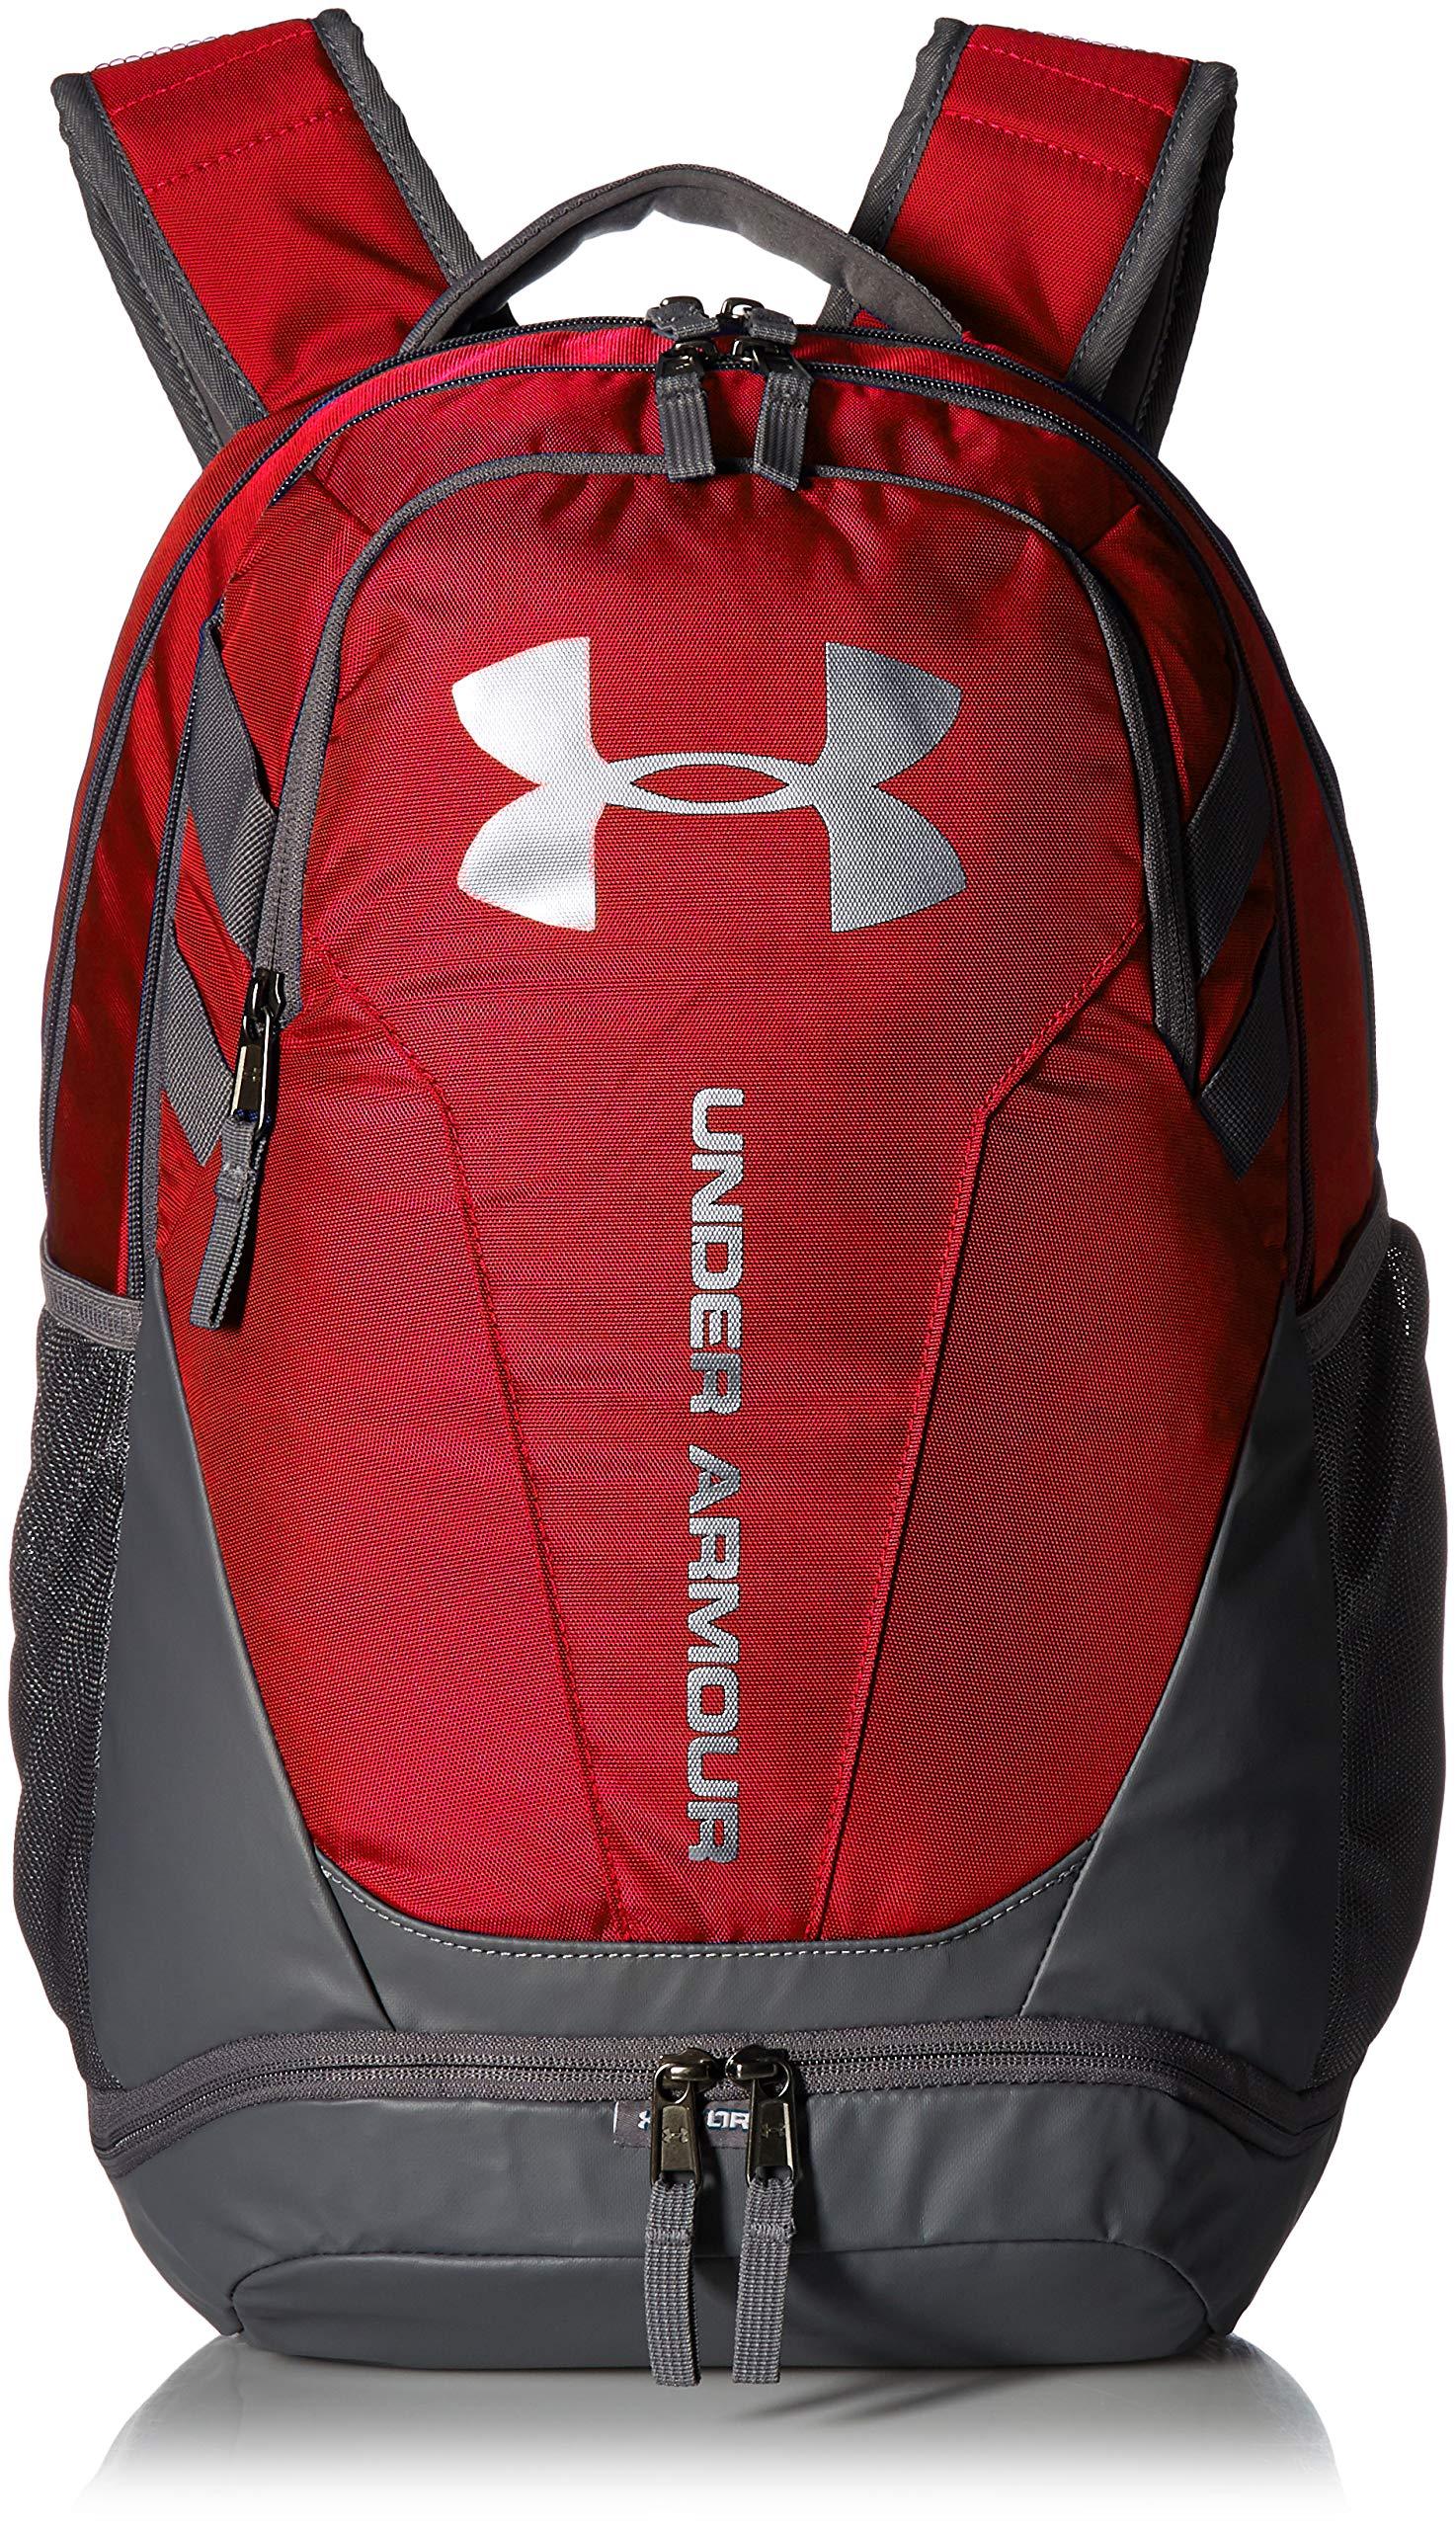 86384aaee4c0 Under Armour Hustle 3.0 Backpack – Glossy Adventures